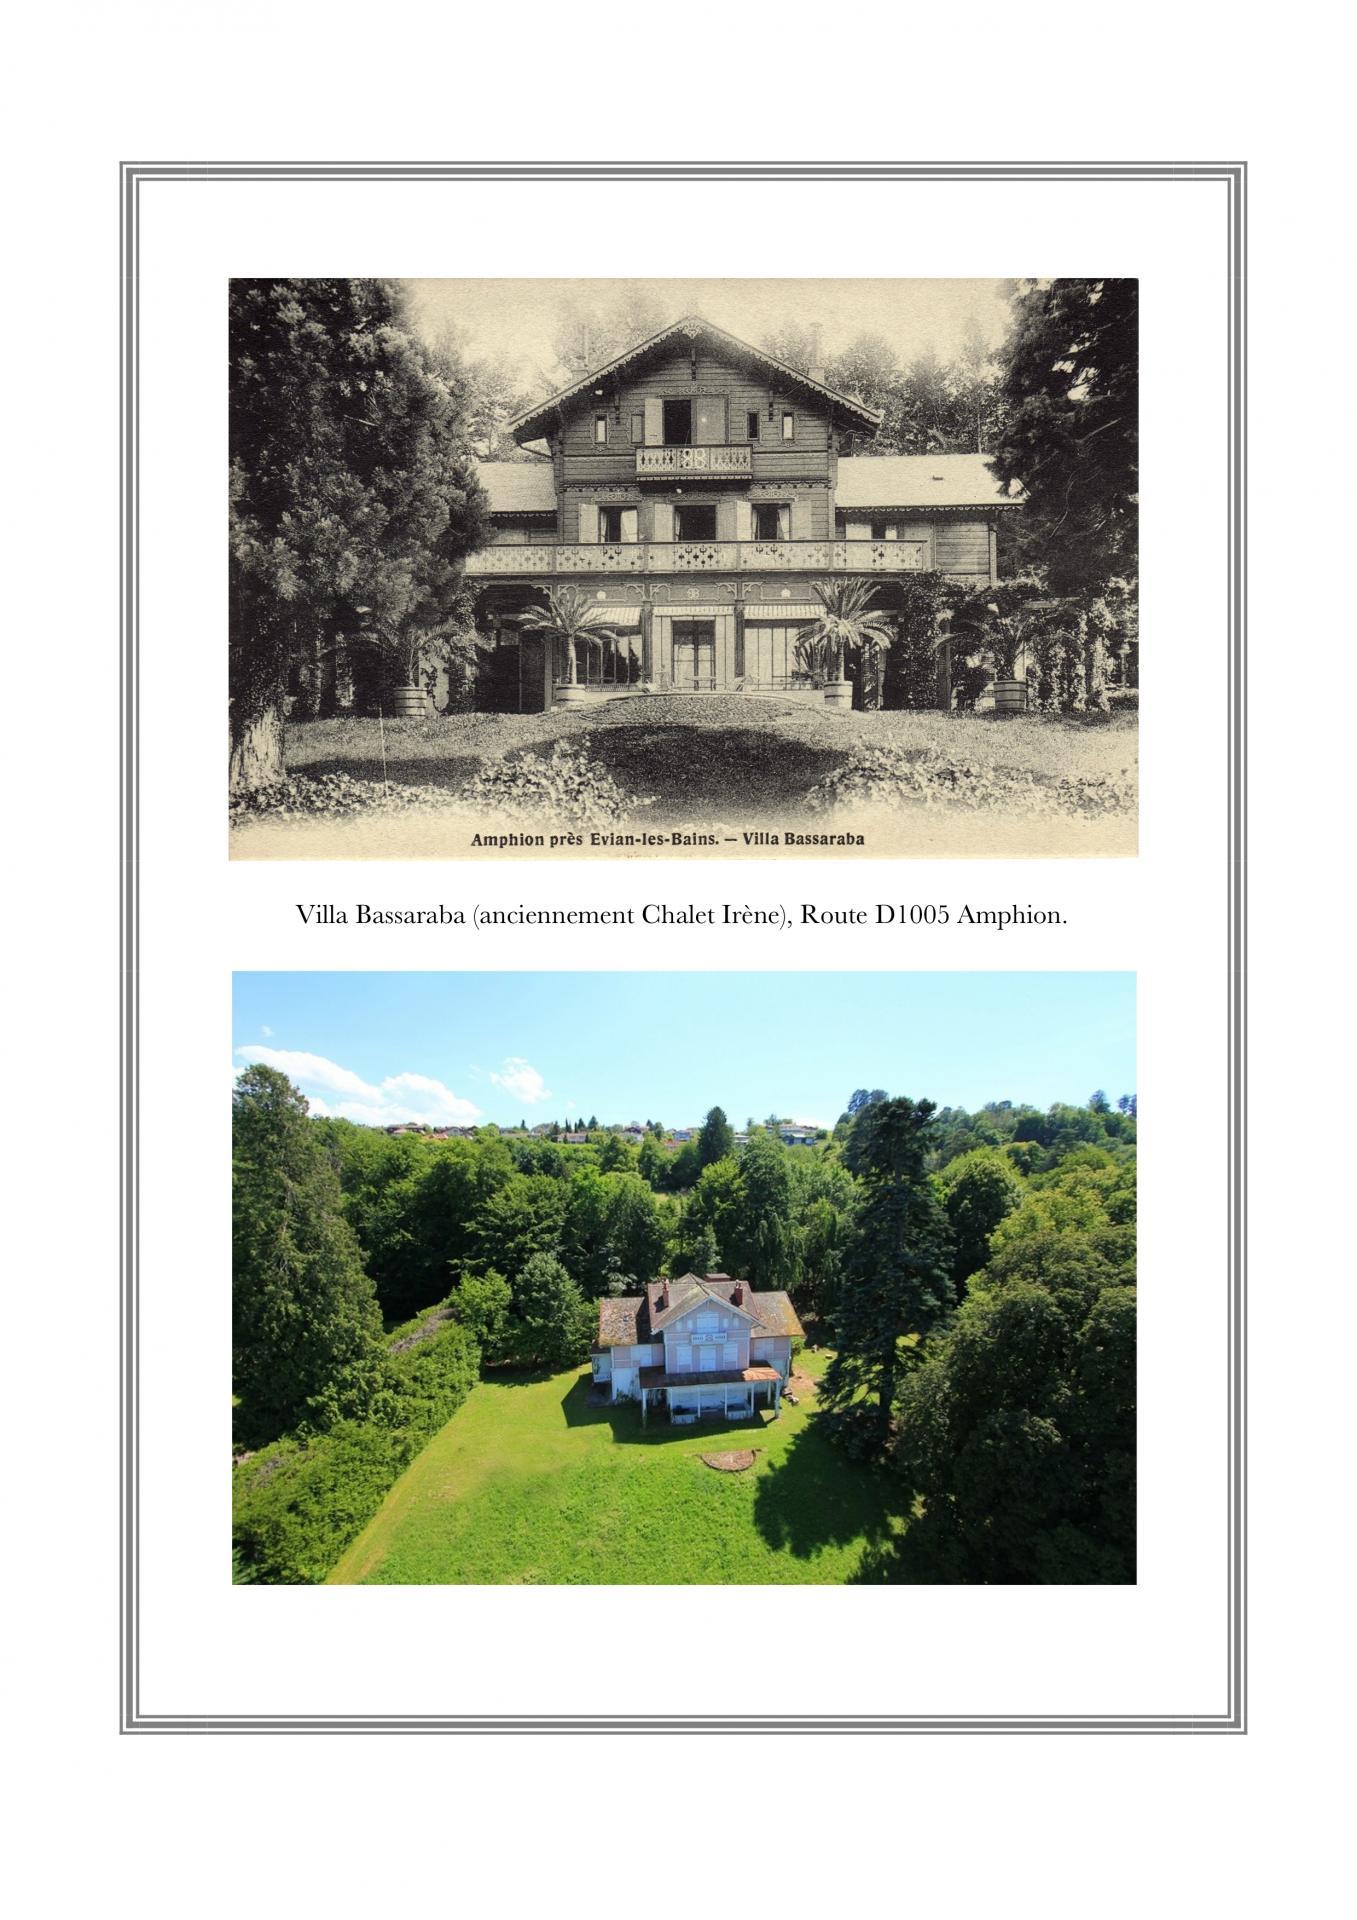 Villa Bassaraba, Rte D1005